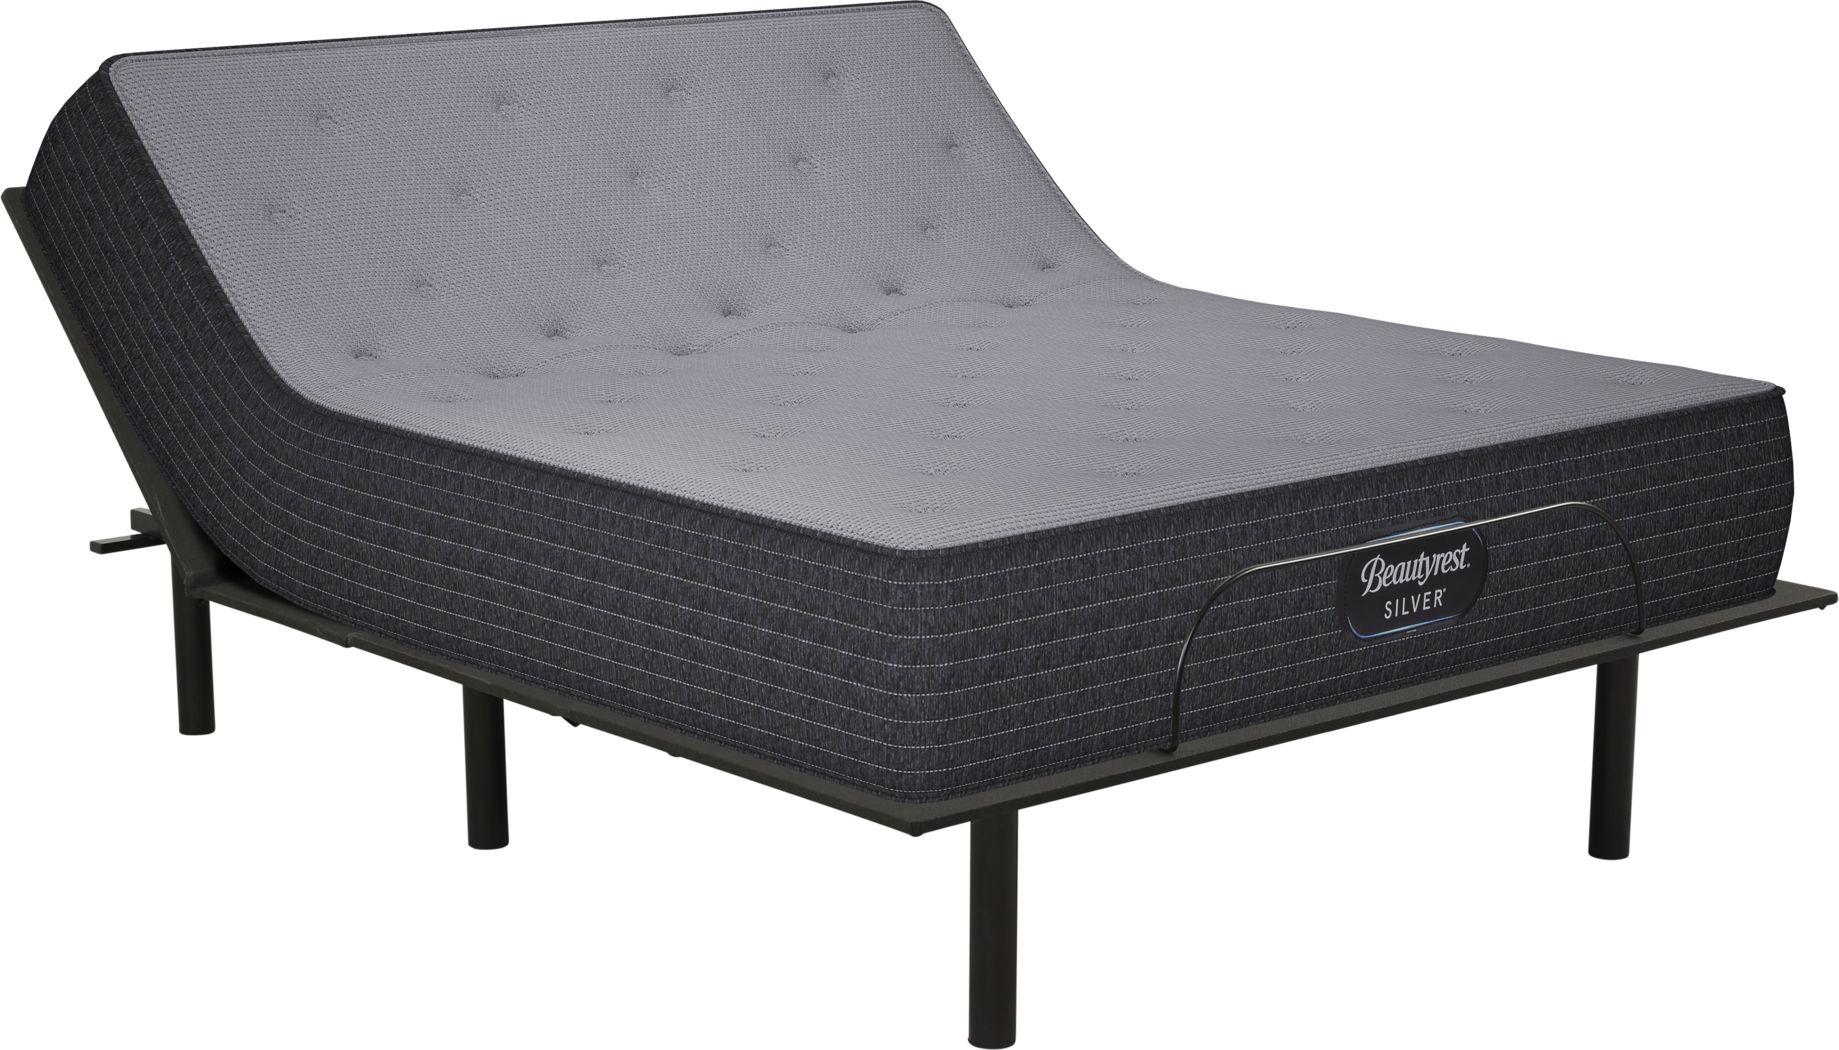 Beautyrest Silver Clover Lane King Mattress with RTG Sleep 2000 Adjustable Base